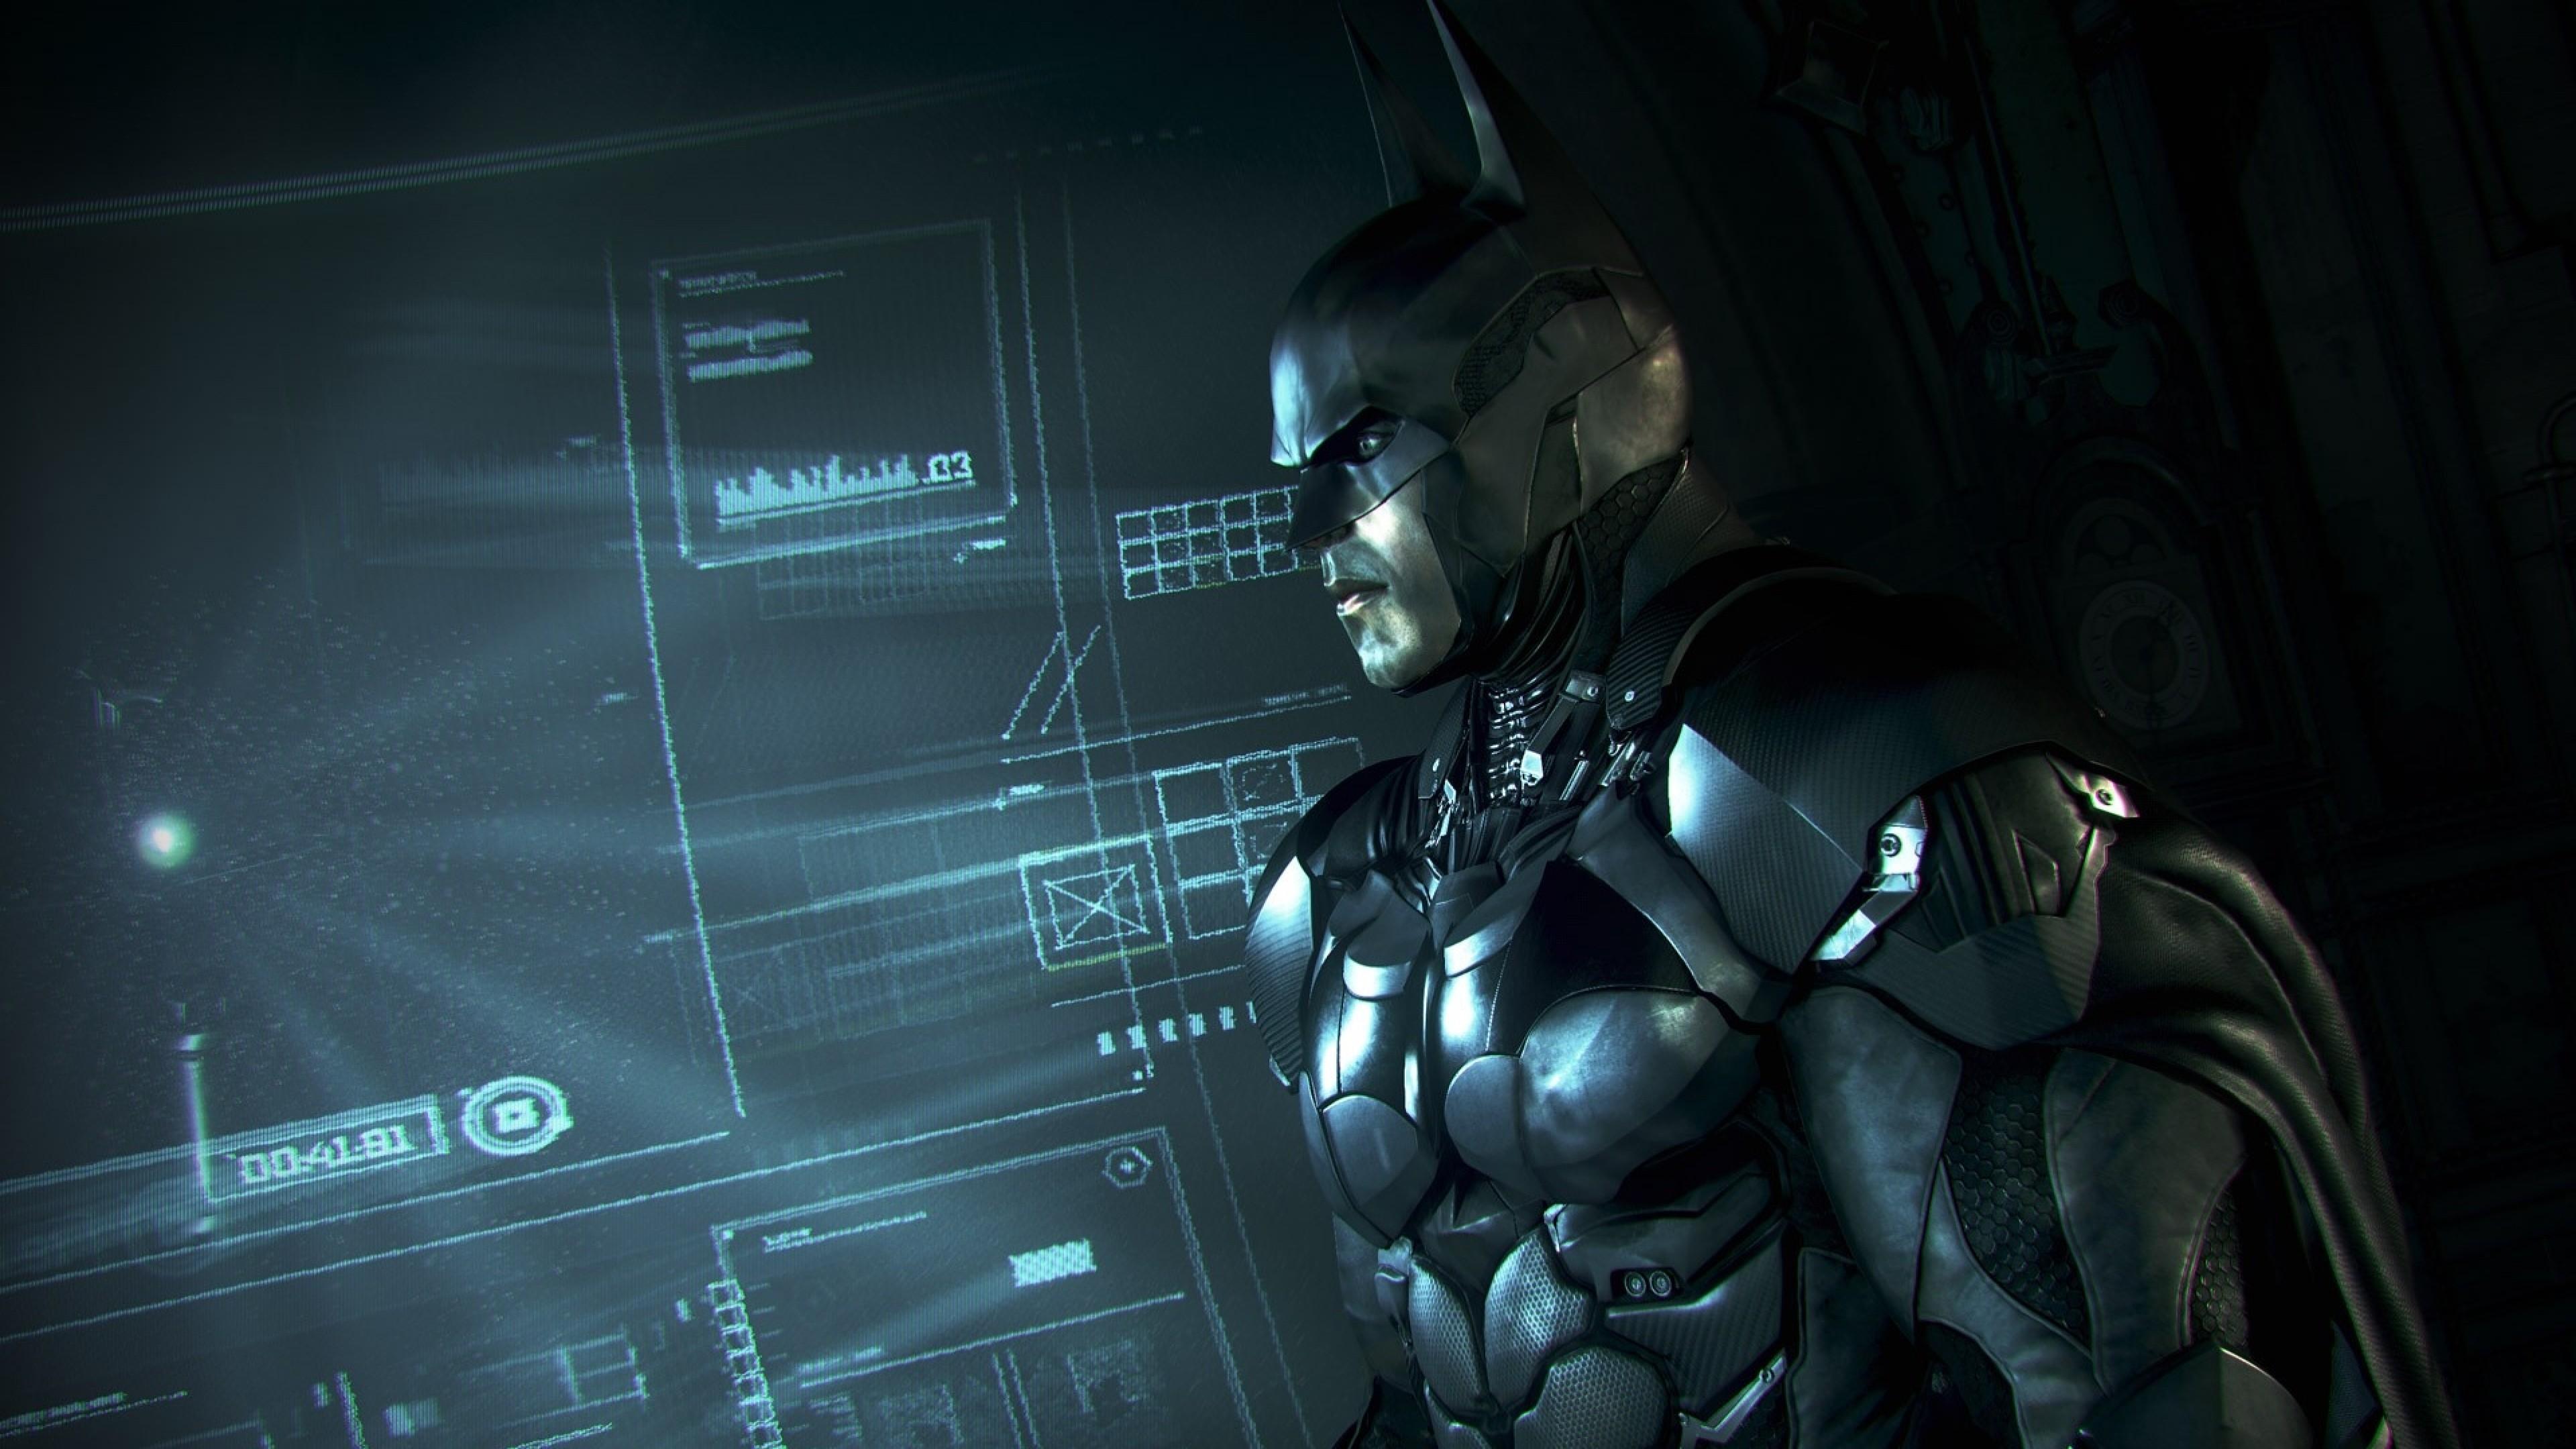 Sfondi videogiochi batman arkham cavaliere rocksteady for Sfondi batman